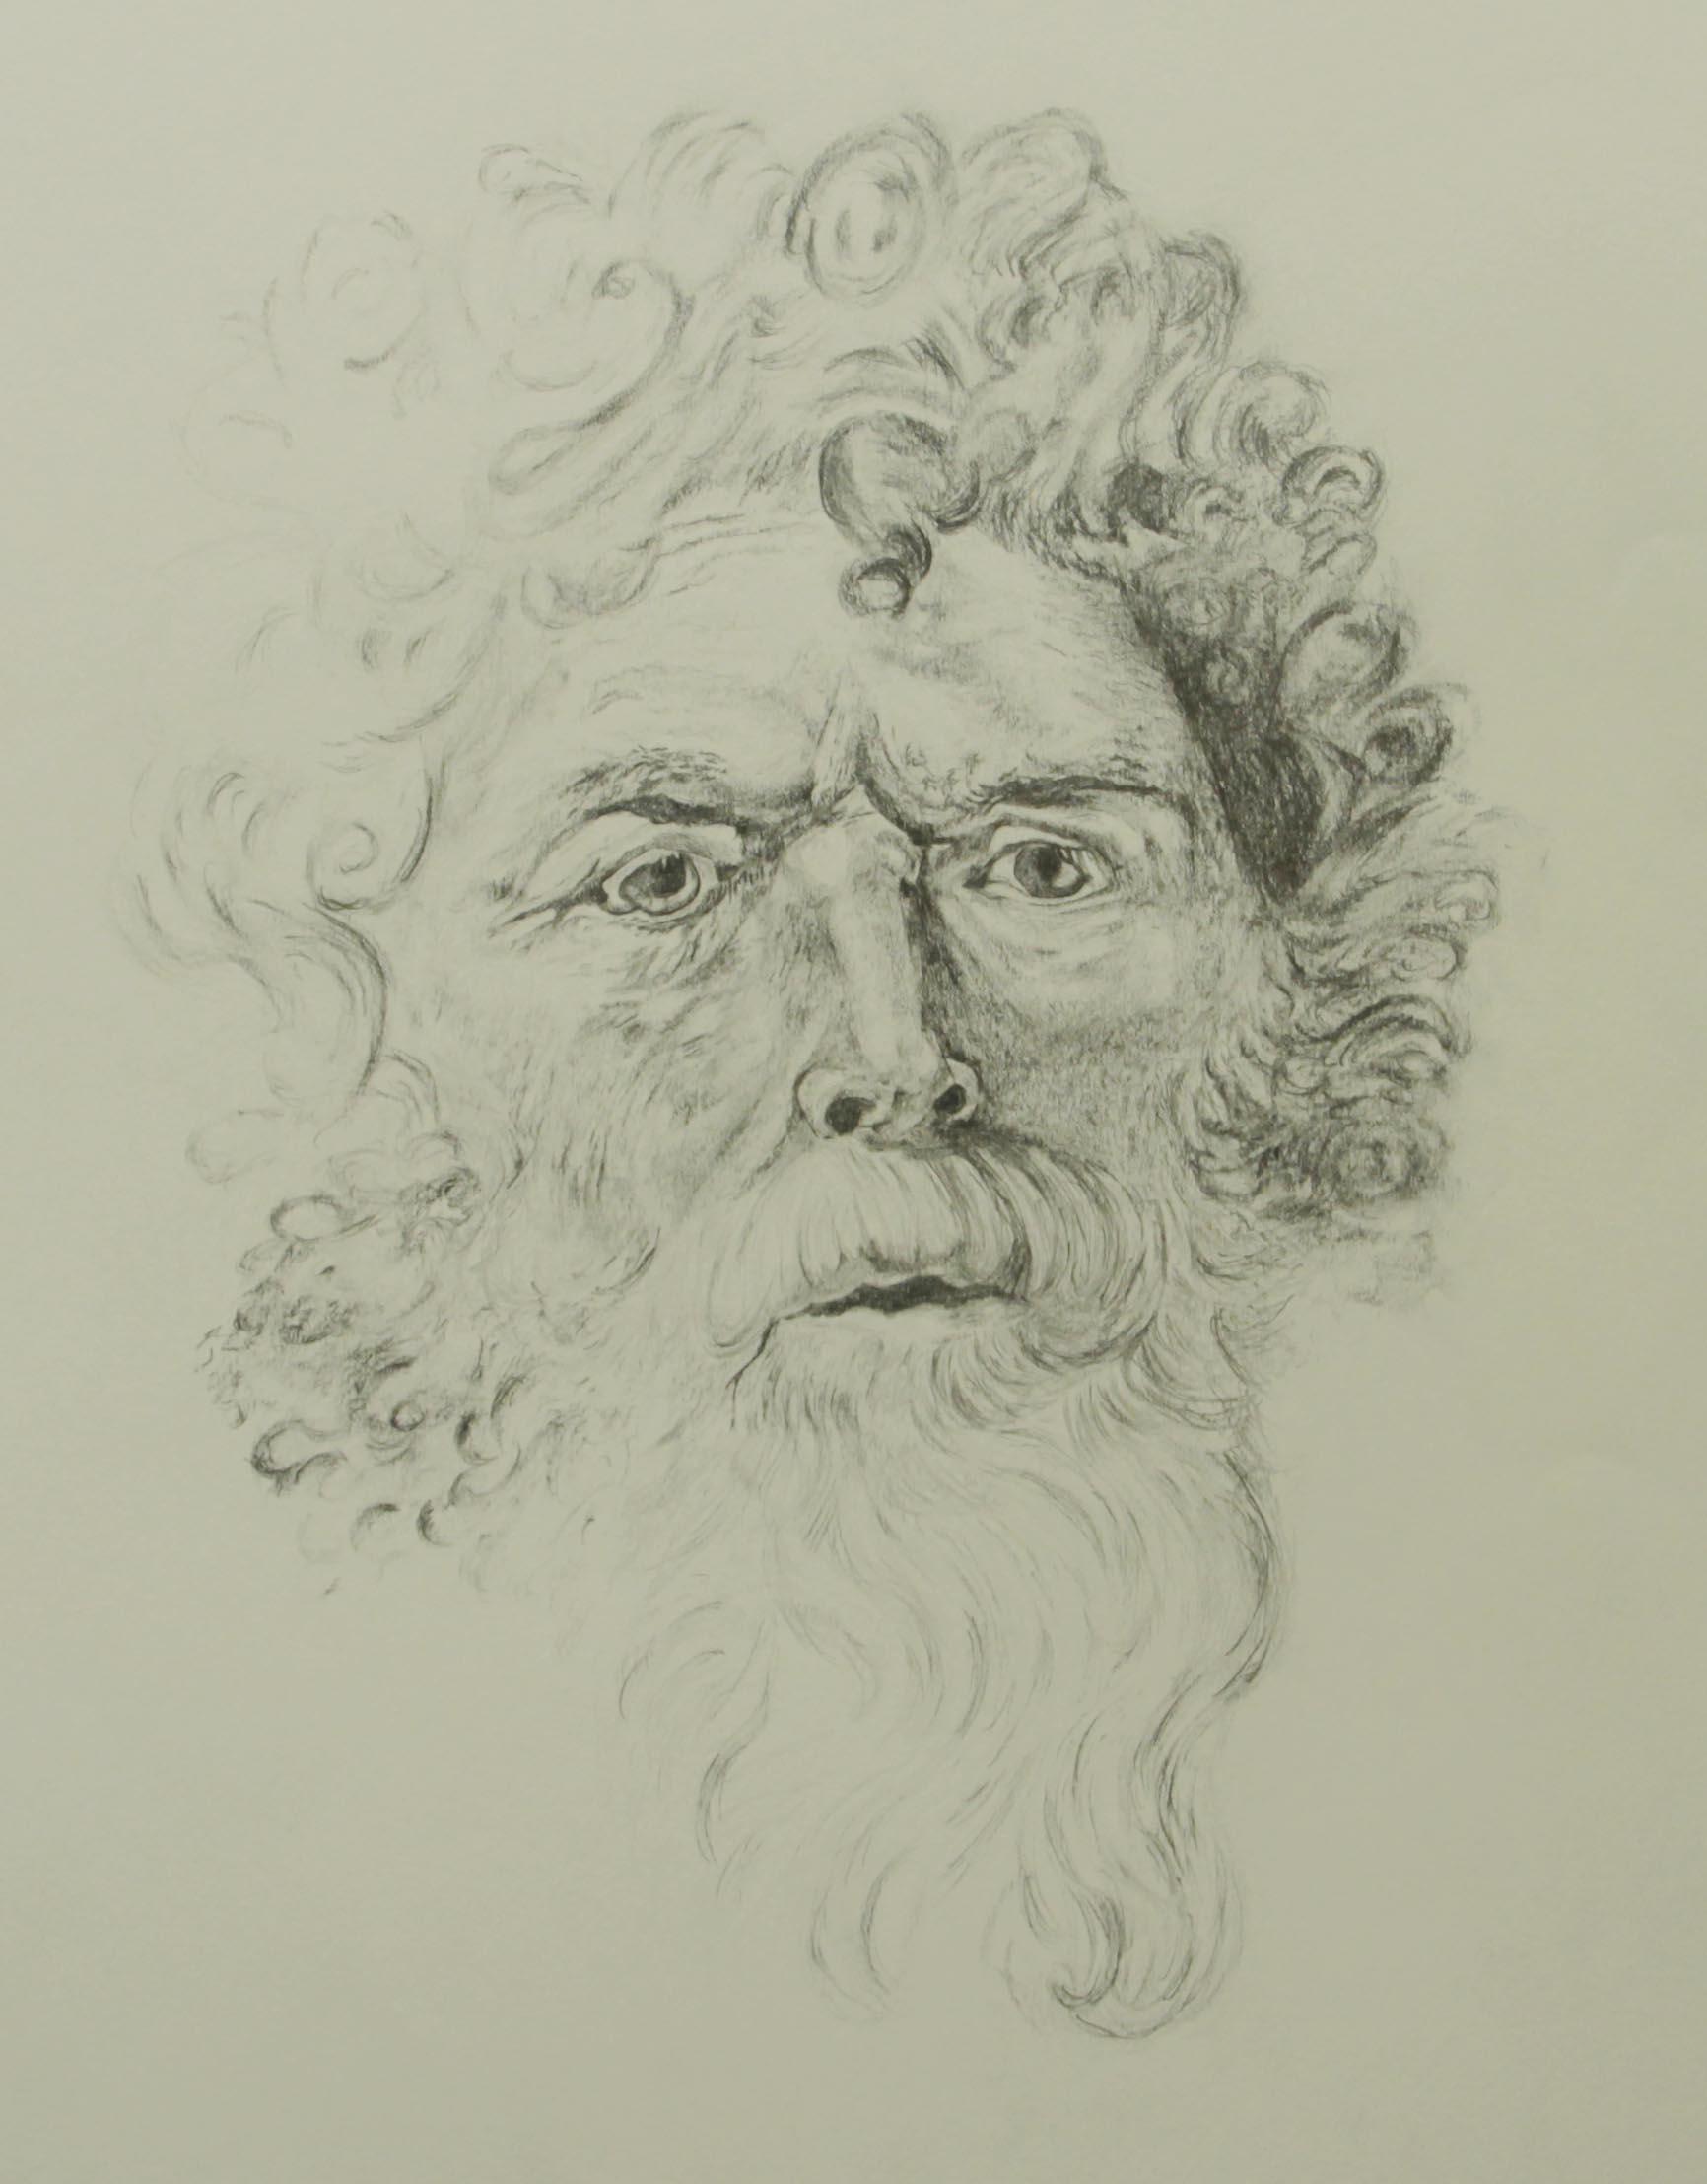 Fabien Staehlin, 34x26